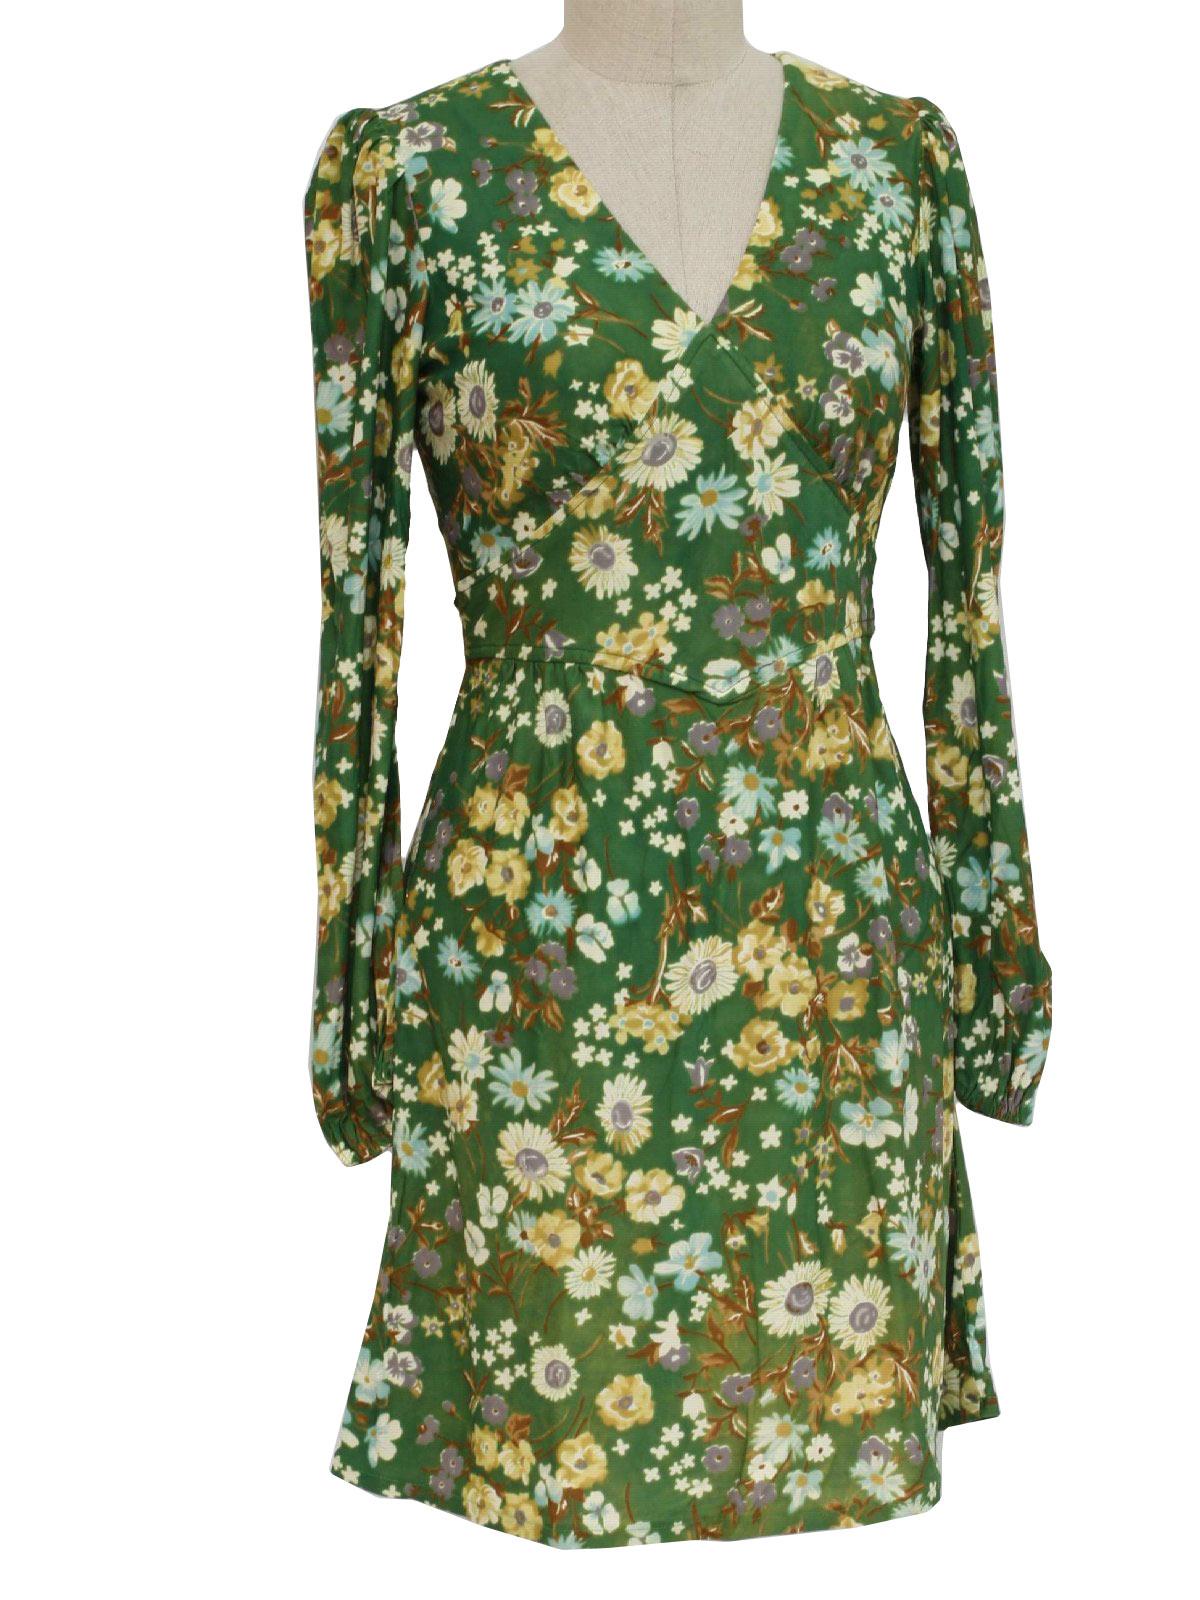 Kristie Lou 70 S Vintage Hippie Dress 70s Kristie Lou